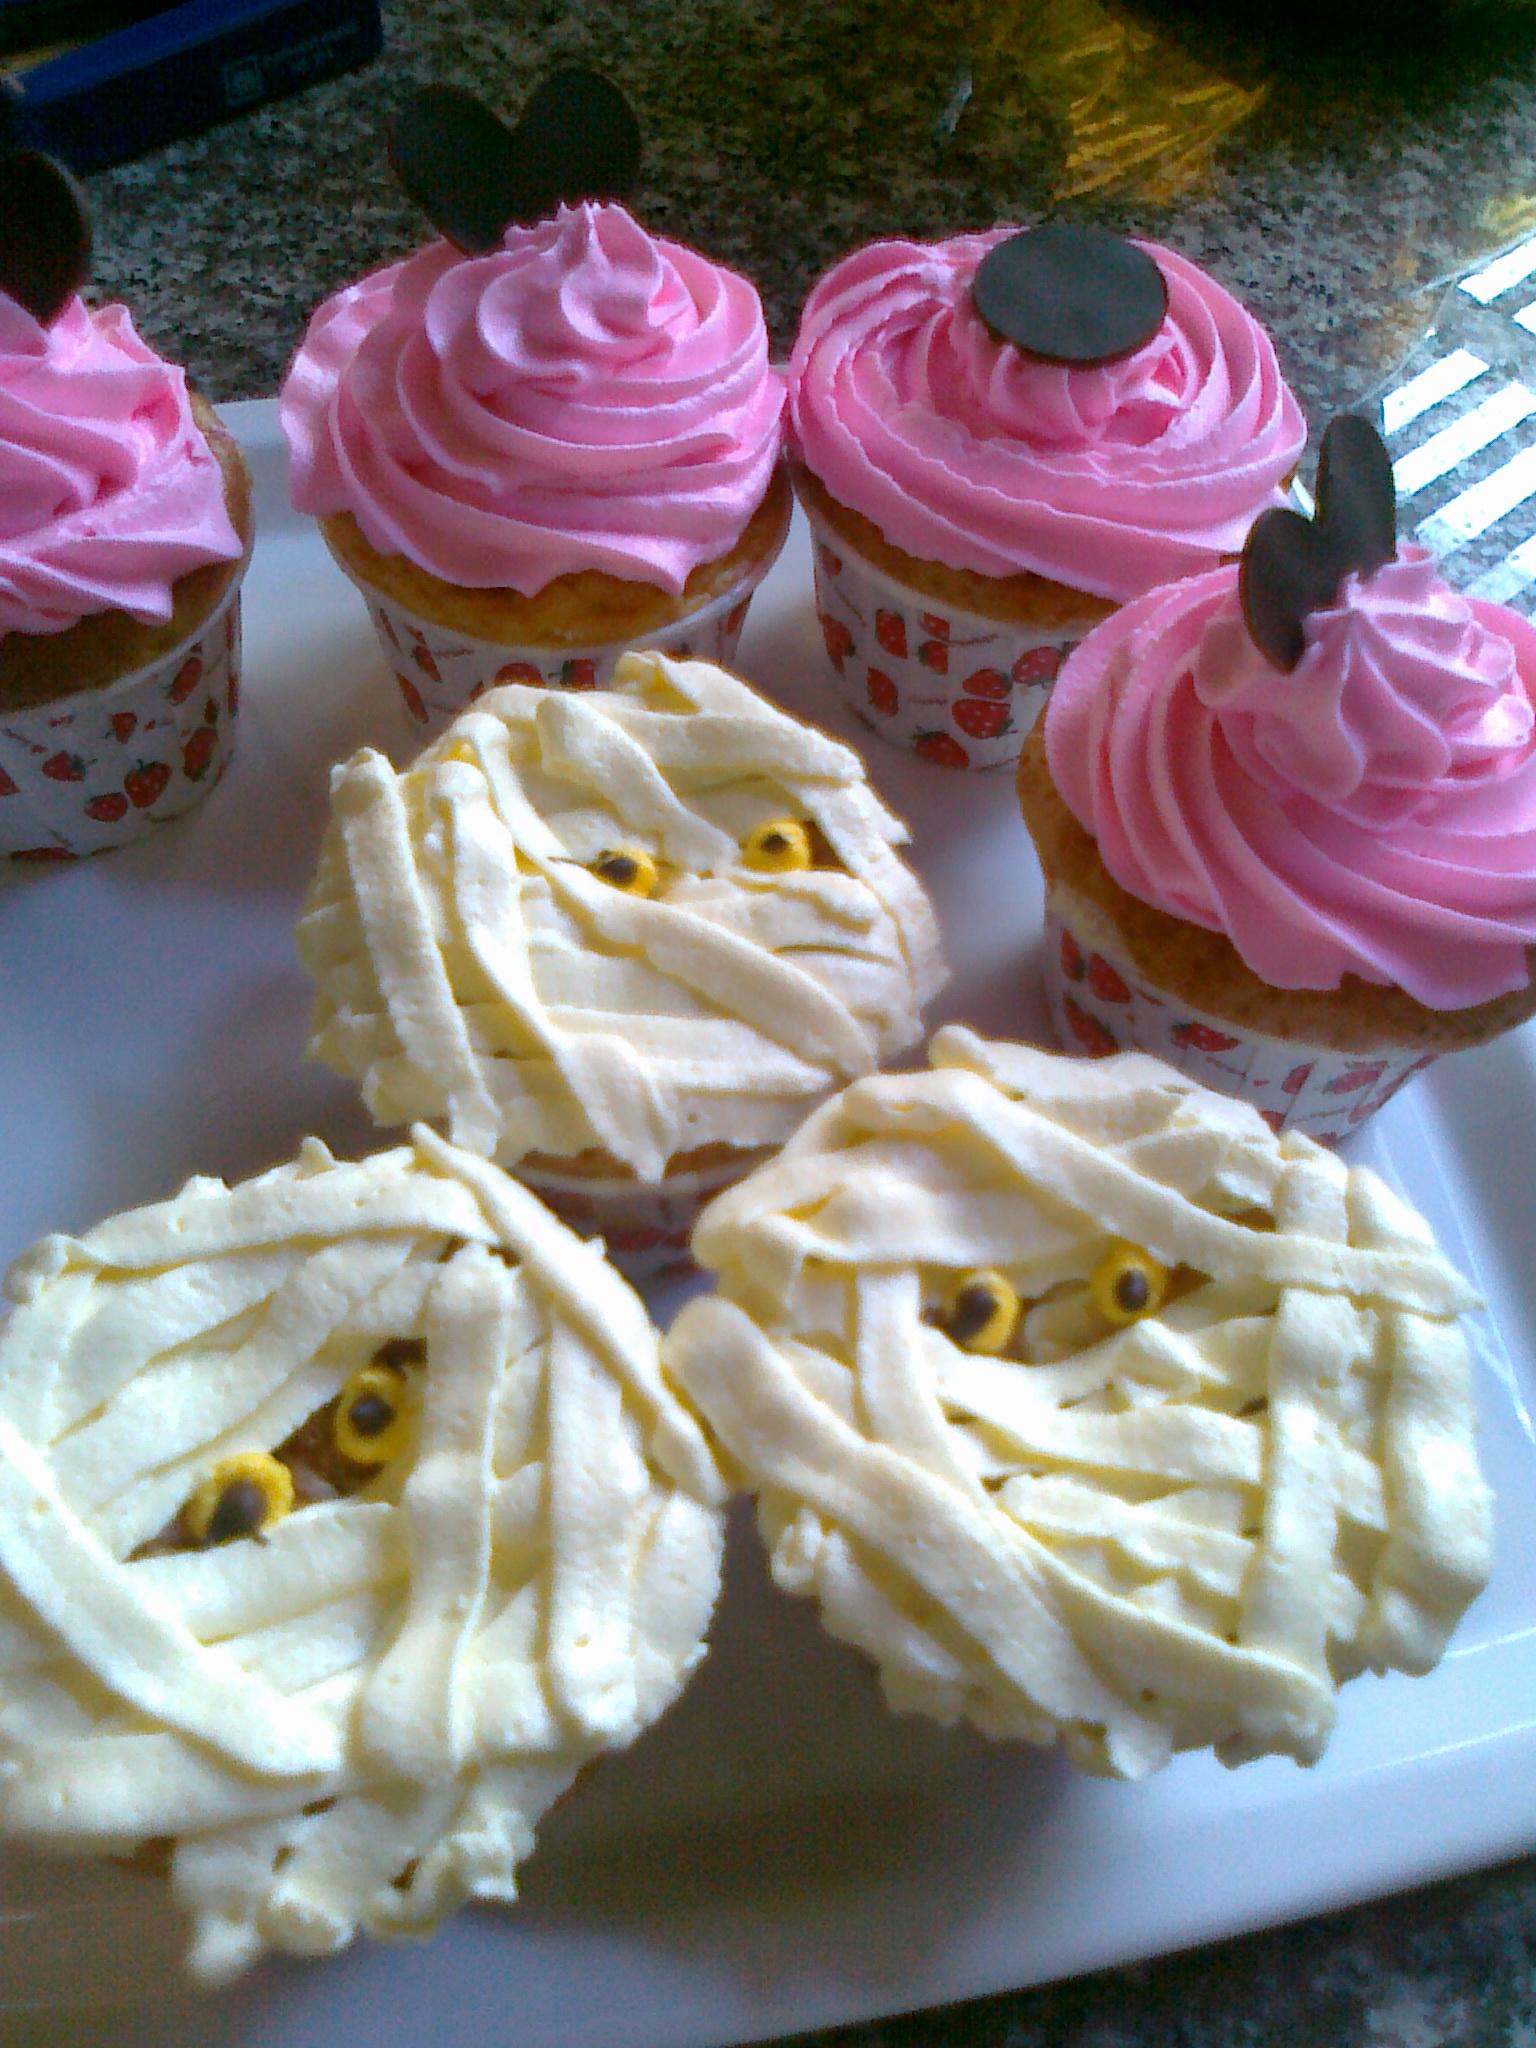 Mai Bakery มี cake ถ้วย หลายชนิด